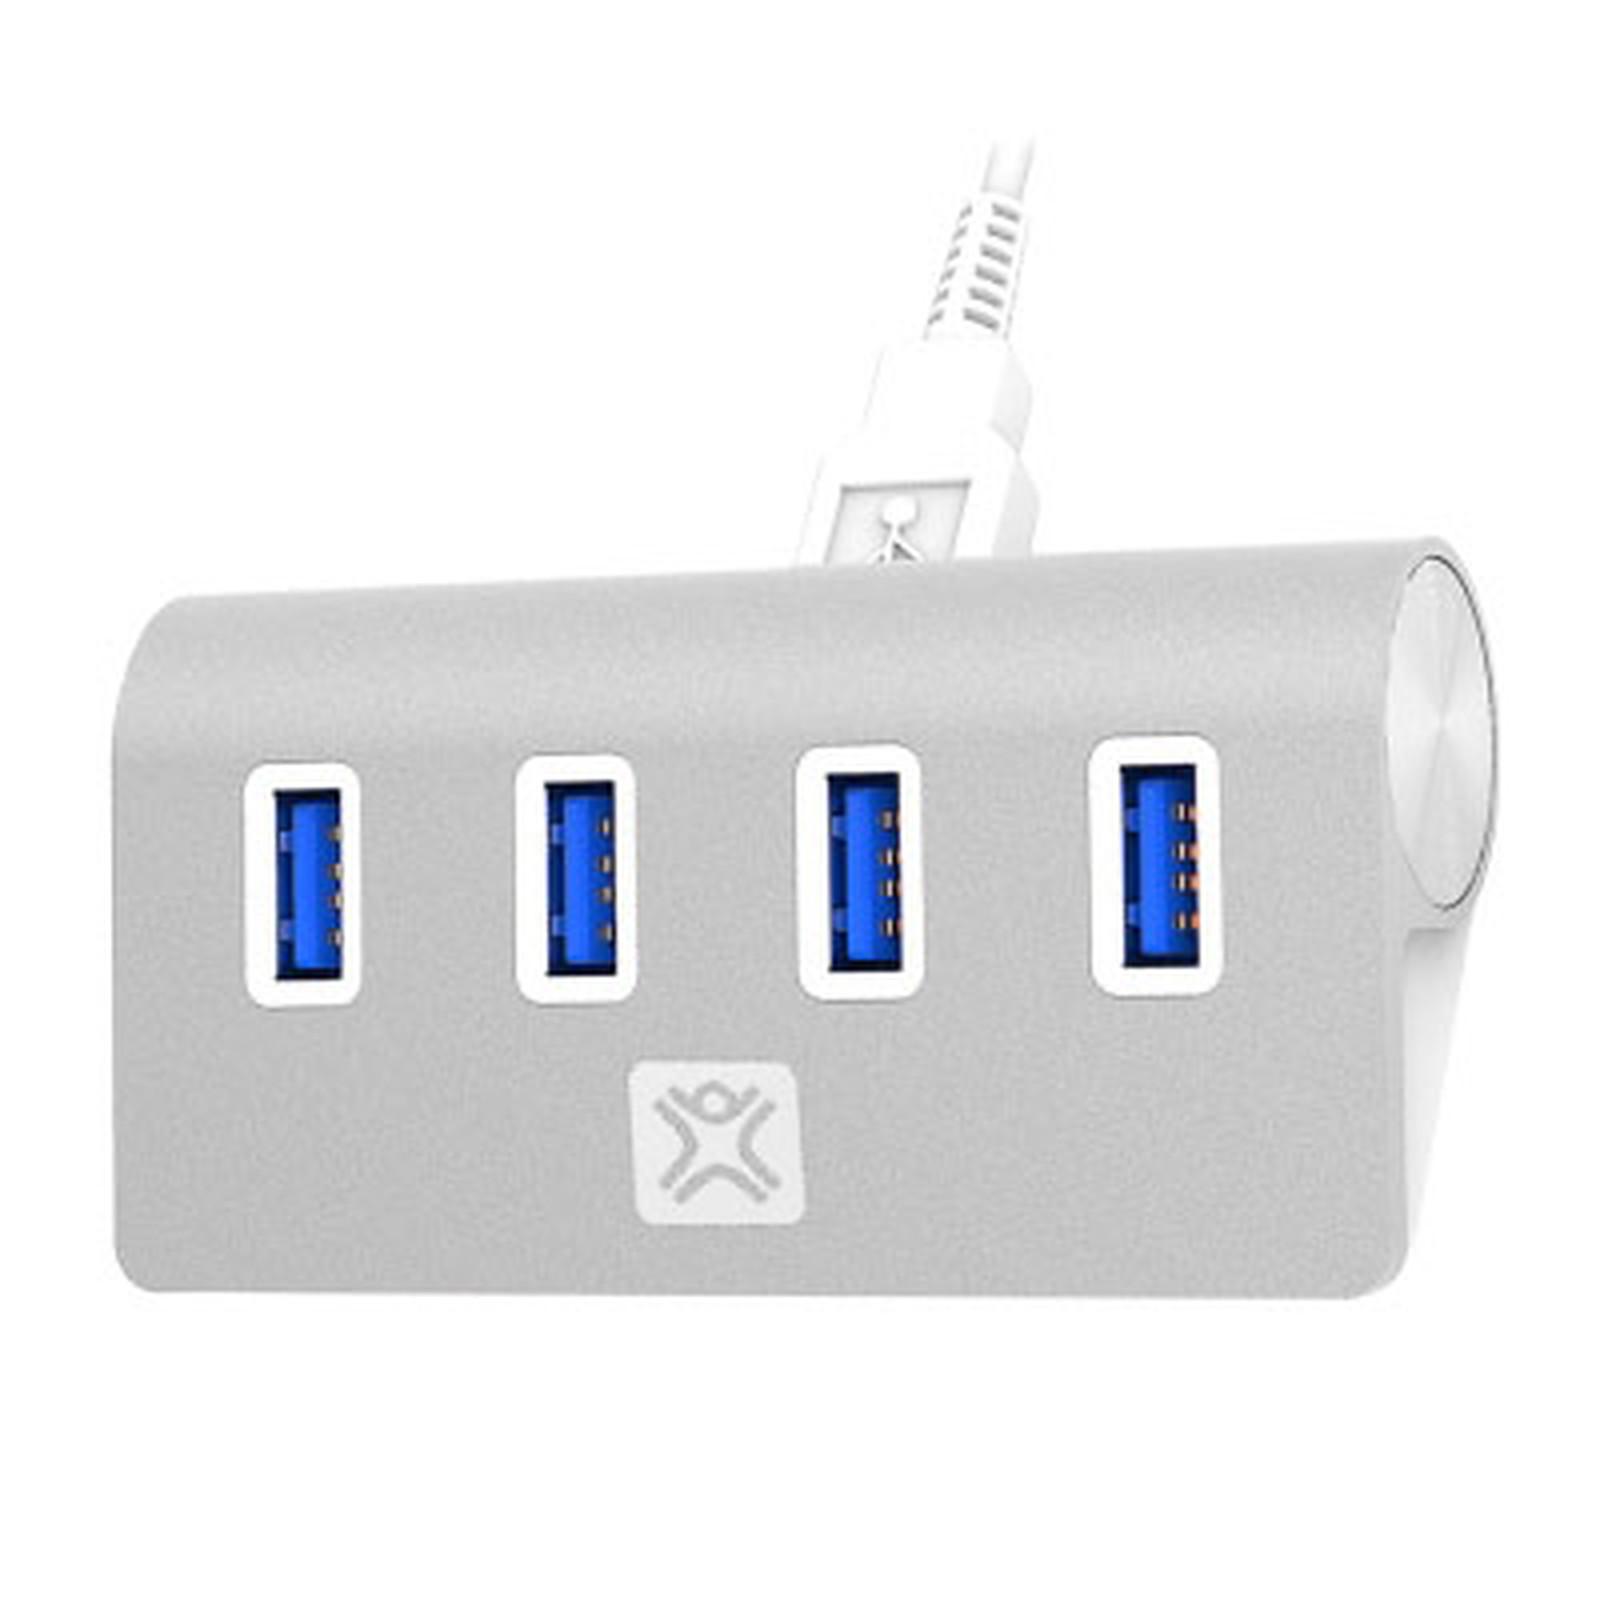 XtremeMac Hub USB 3.0 4 ports